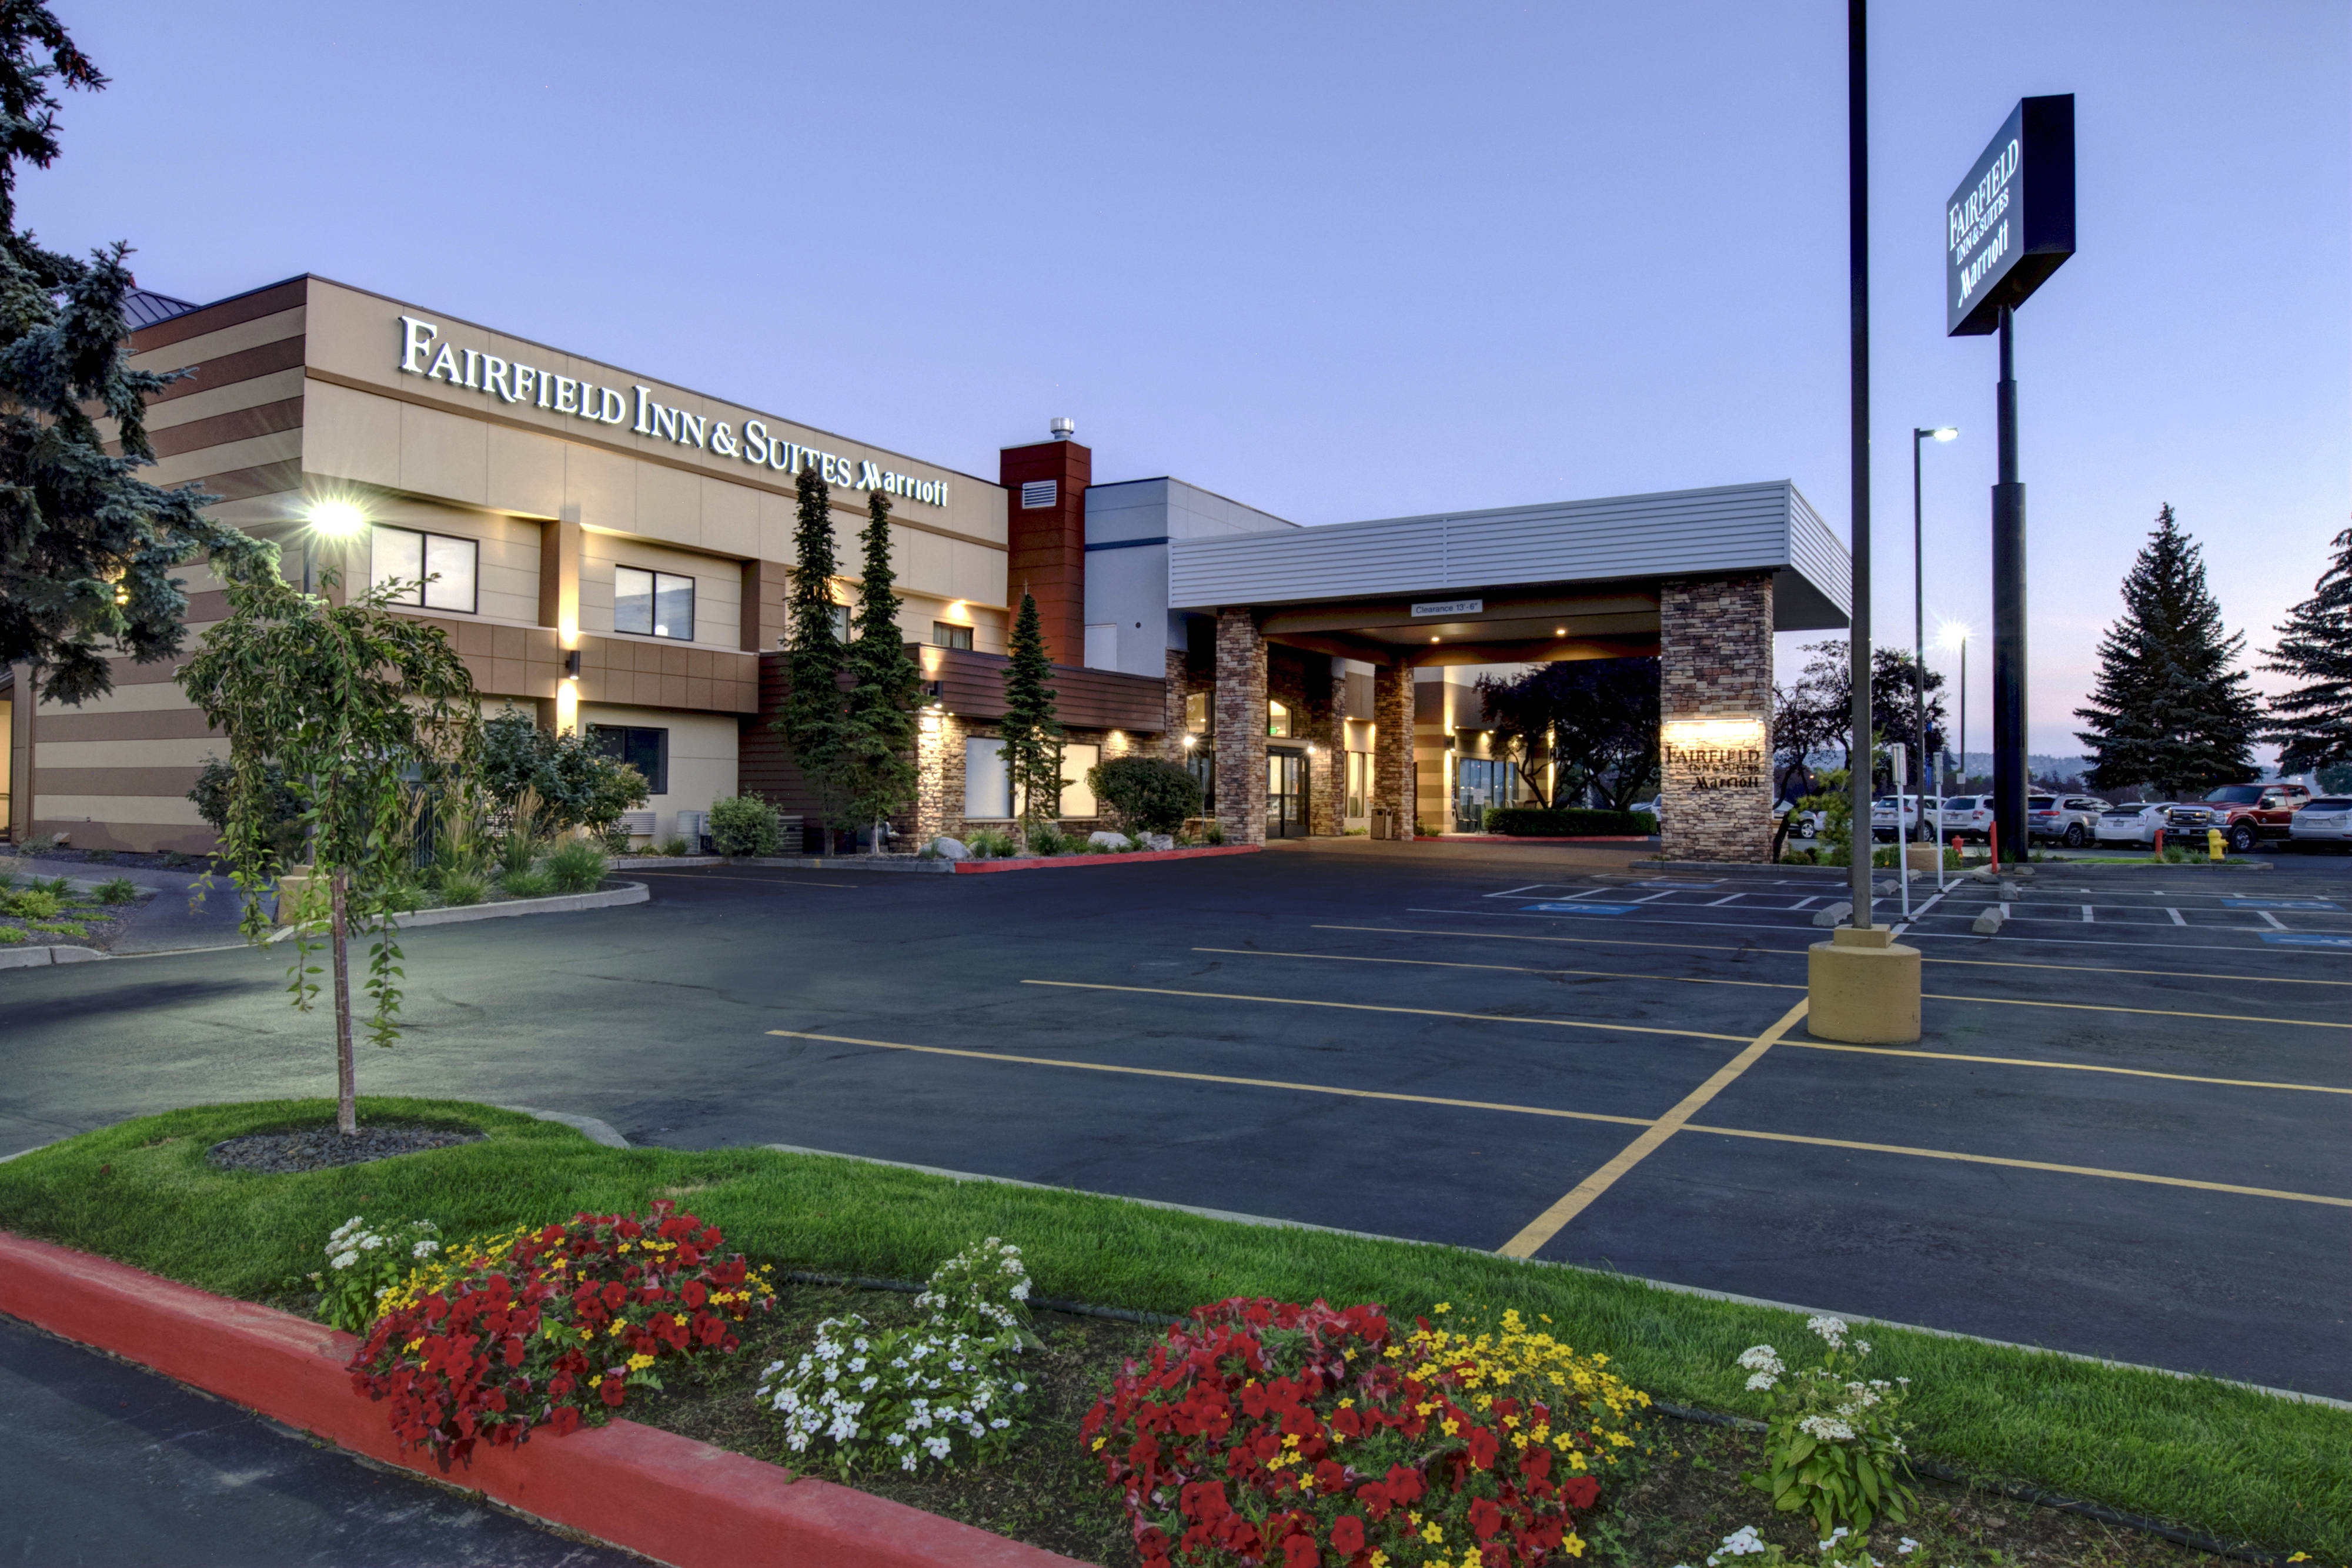 Fairfield Inn & Suites  Marriott Spokane